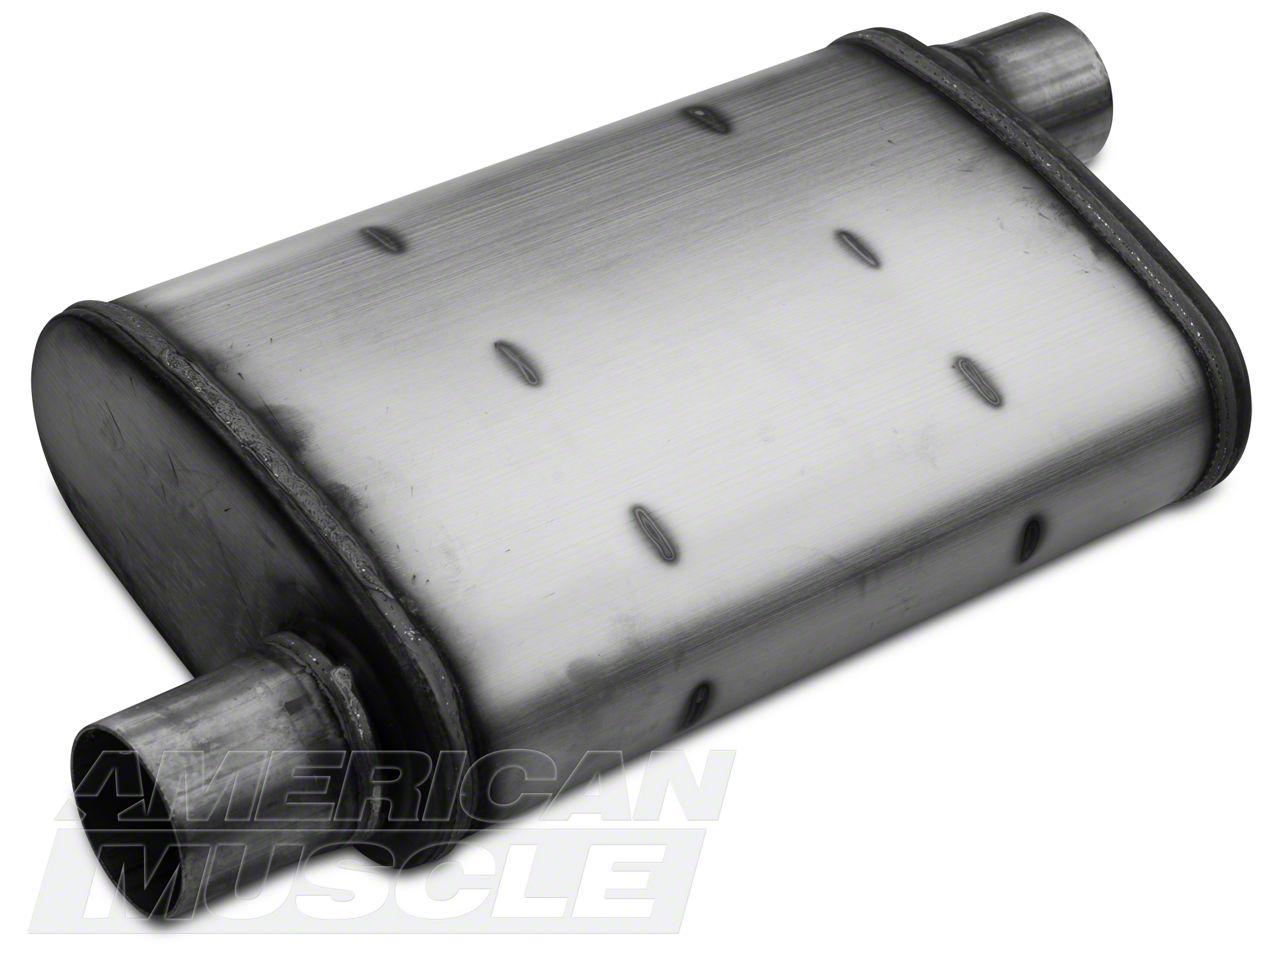 "Center One colt universal Stainless steel performance muffler 2.25/"" Offset"